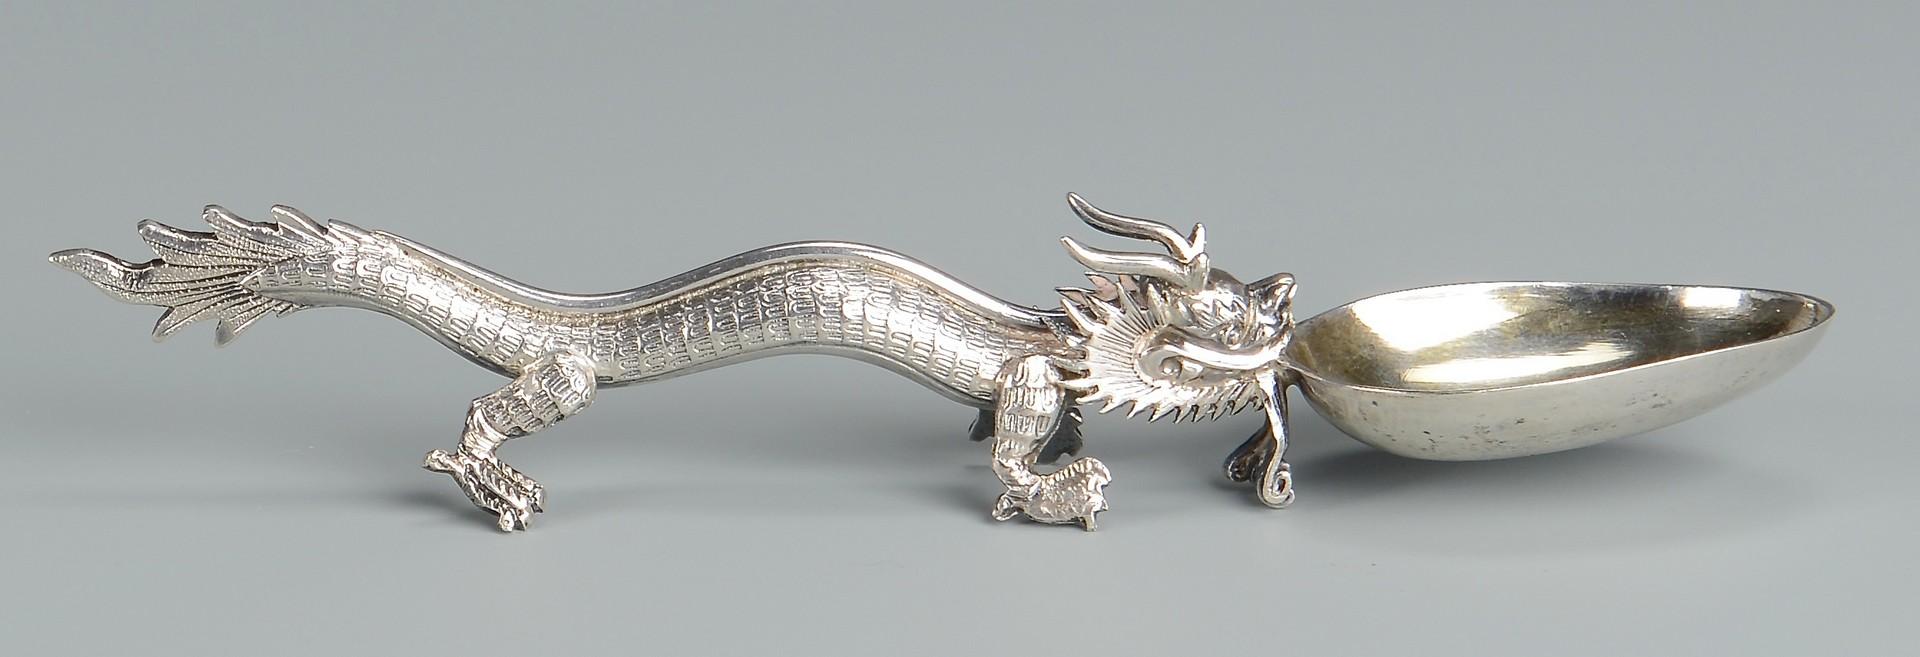 Lot 2: Group Asian Silver & Jewelry, 15 pcs.